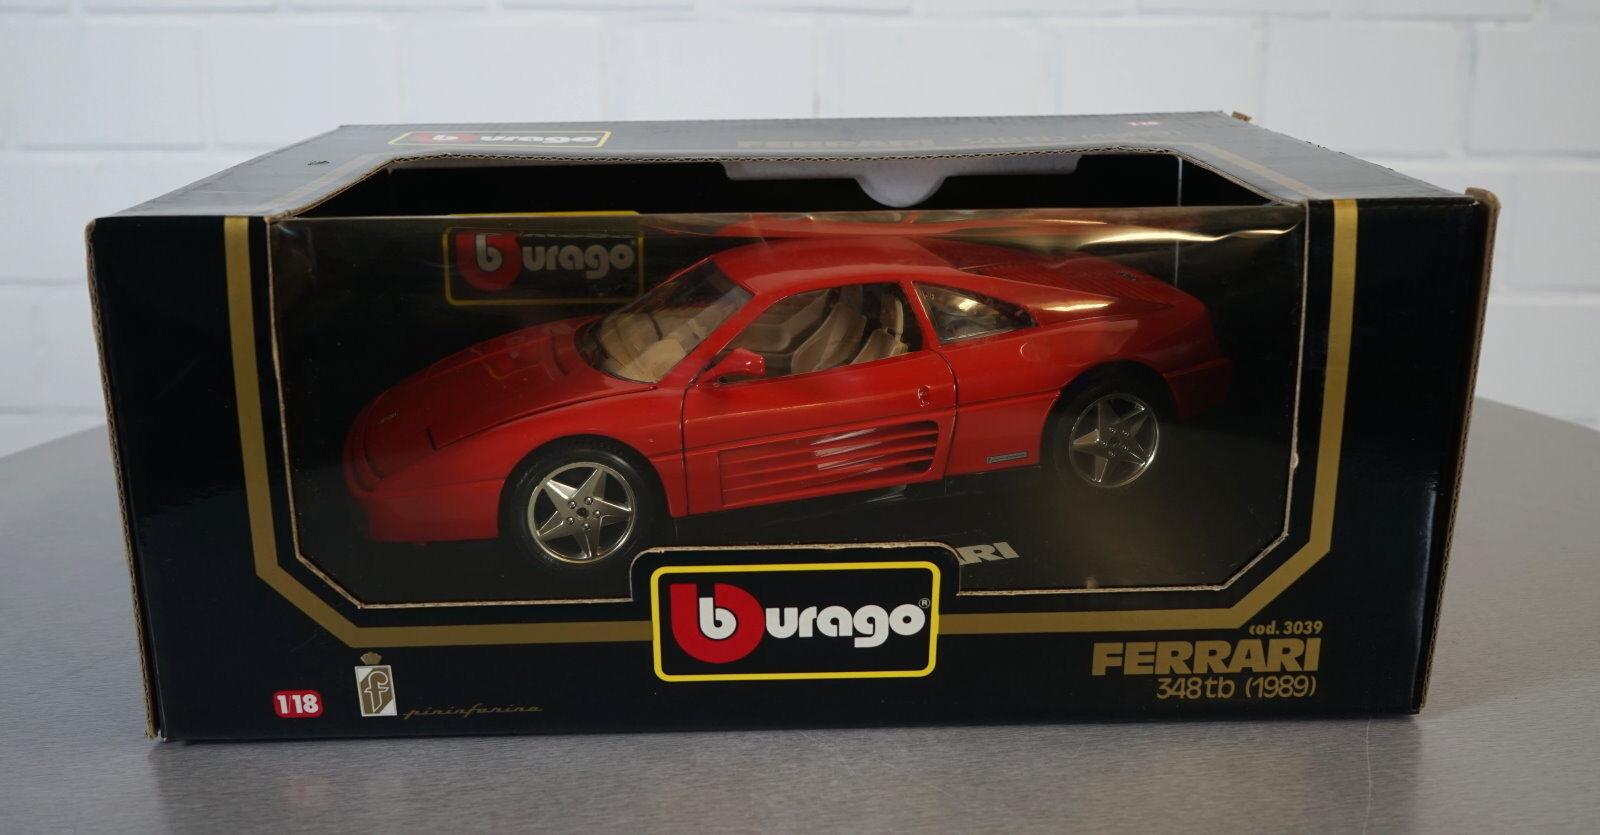 Burago 1   18 ferrari 348tb (1989) rot - 427 - druckguss scale modell auto neu ovp